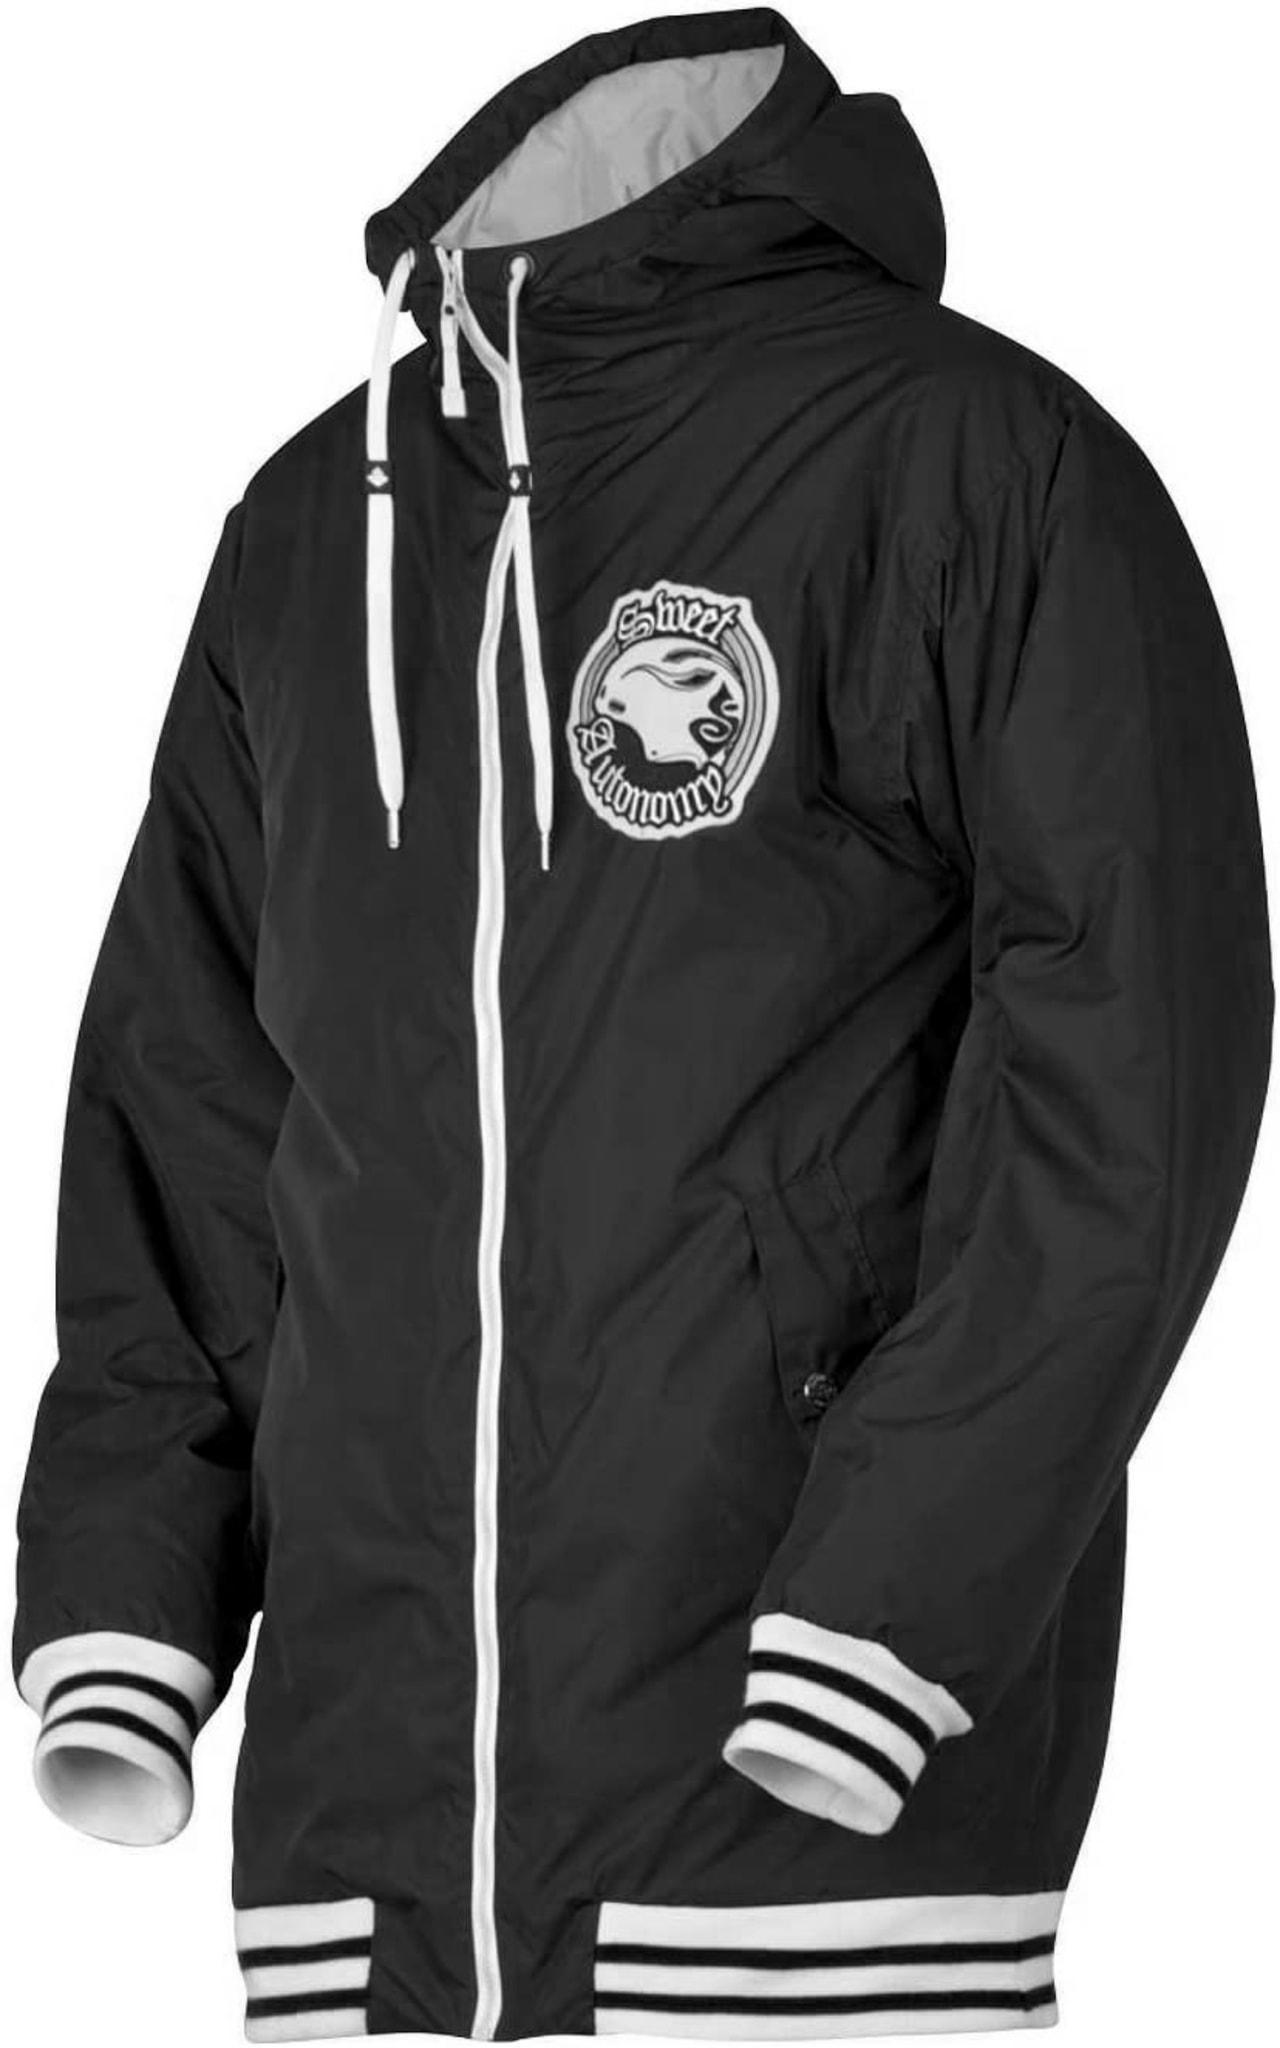 Streetfighter Jacket